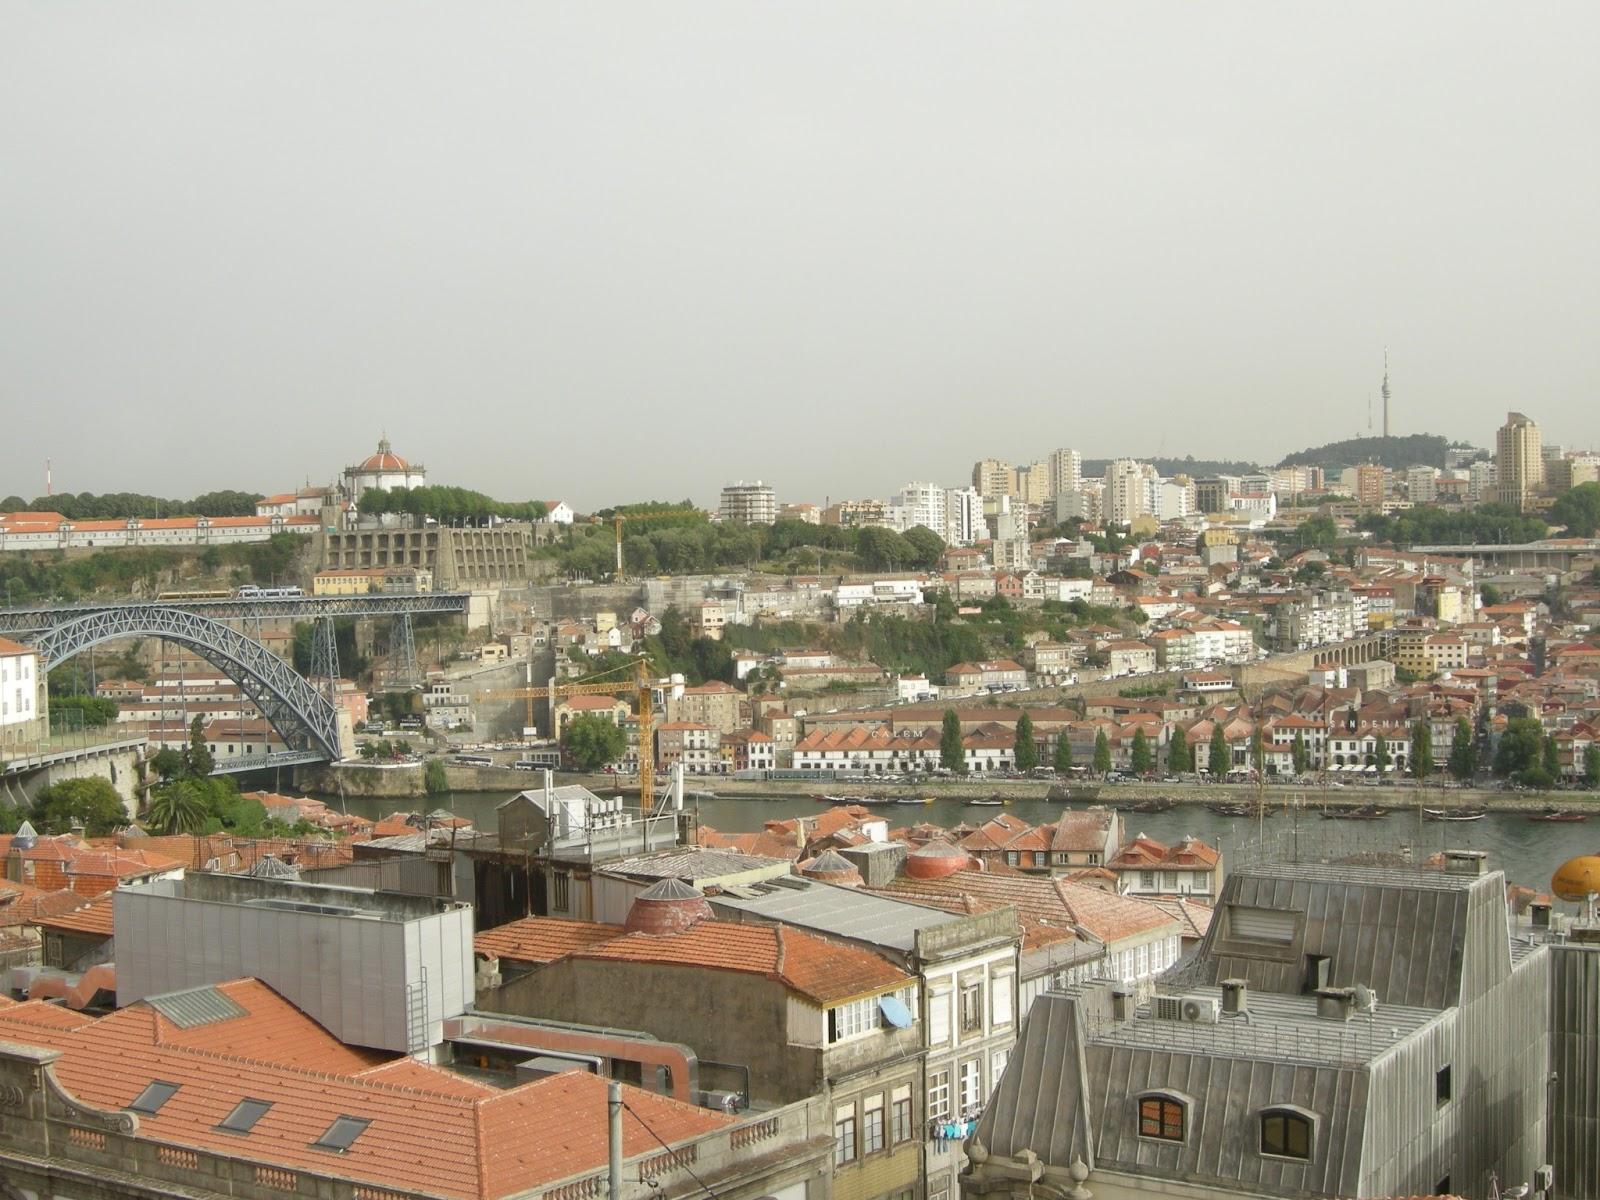 Oporto, Portugal con encanto